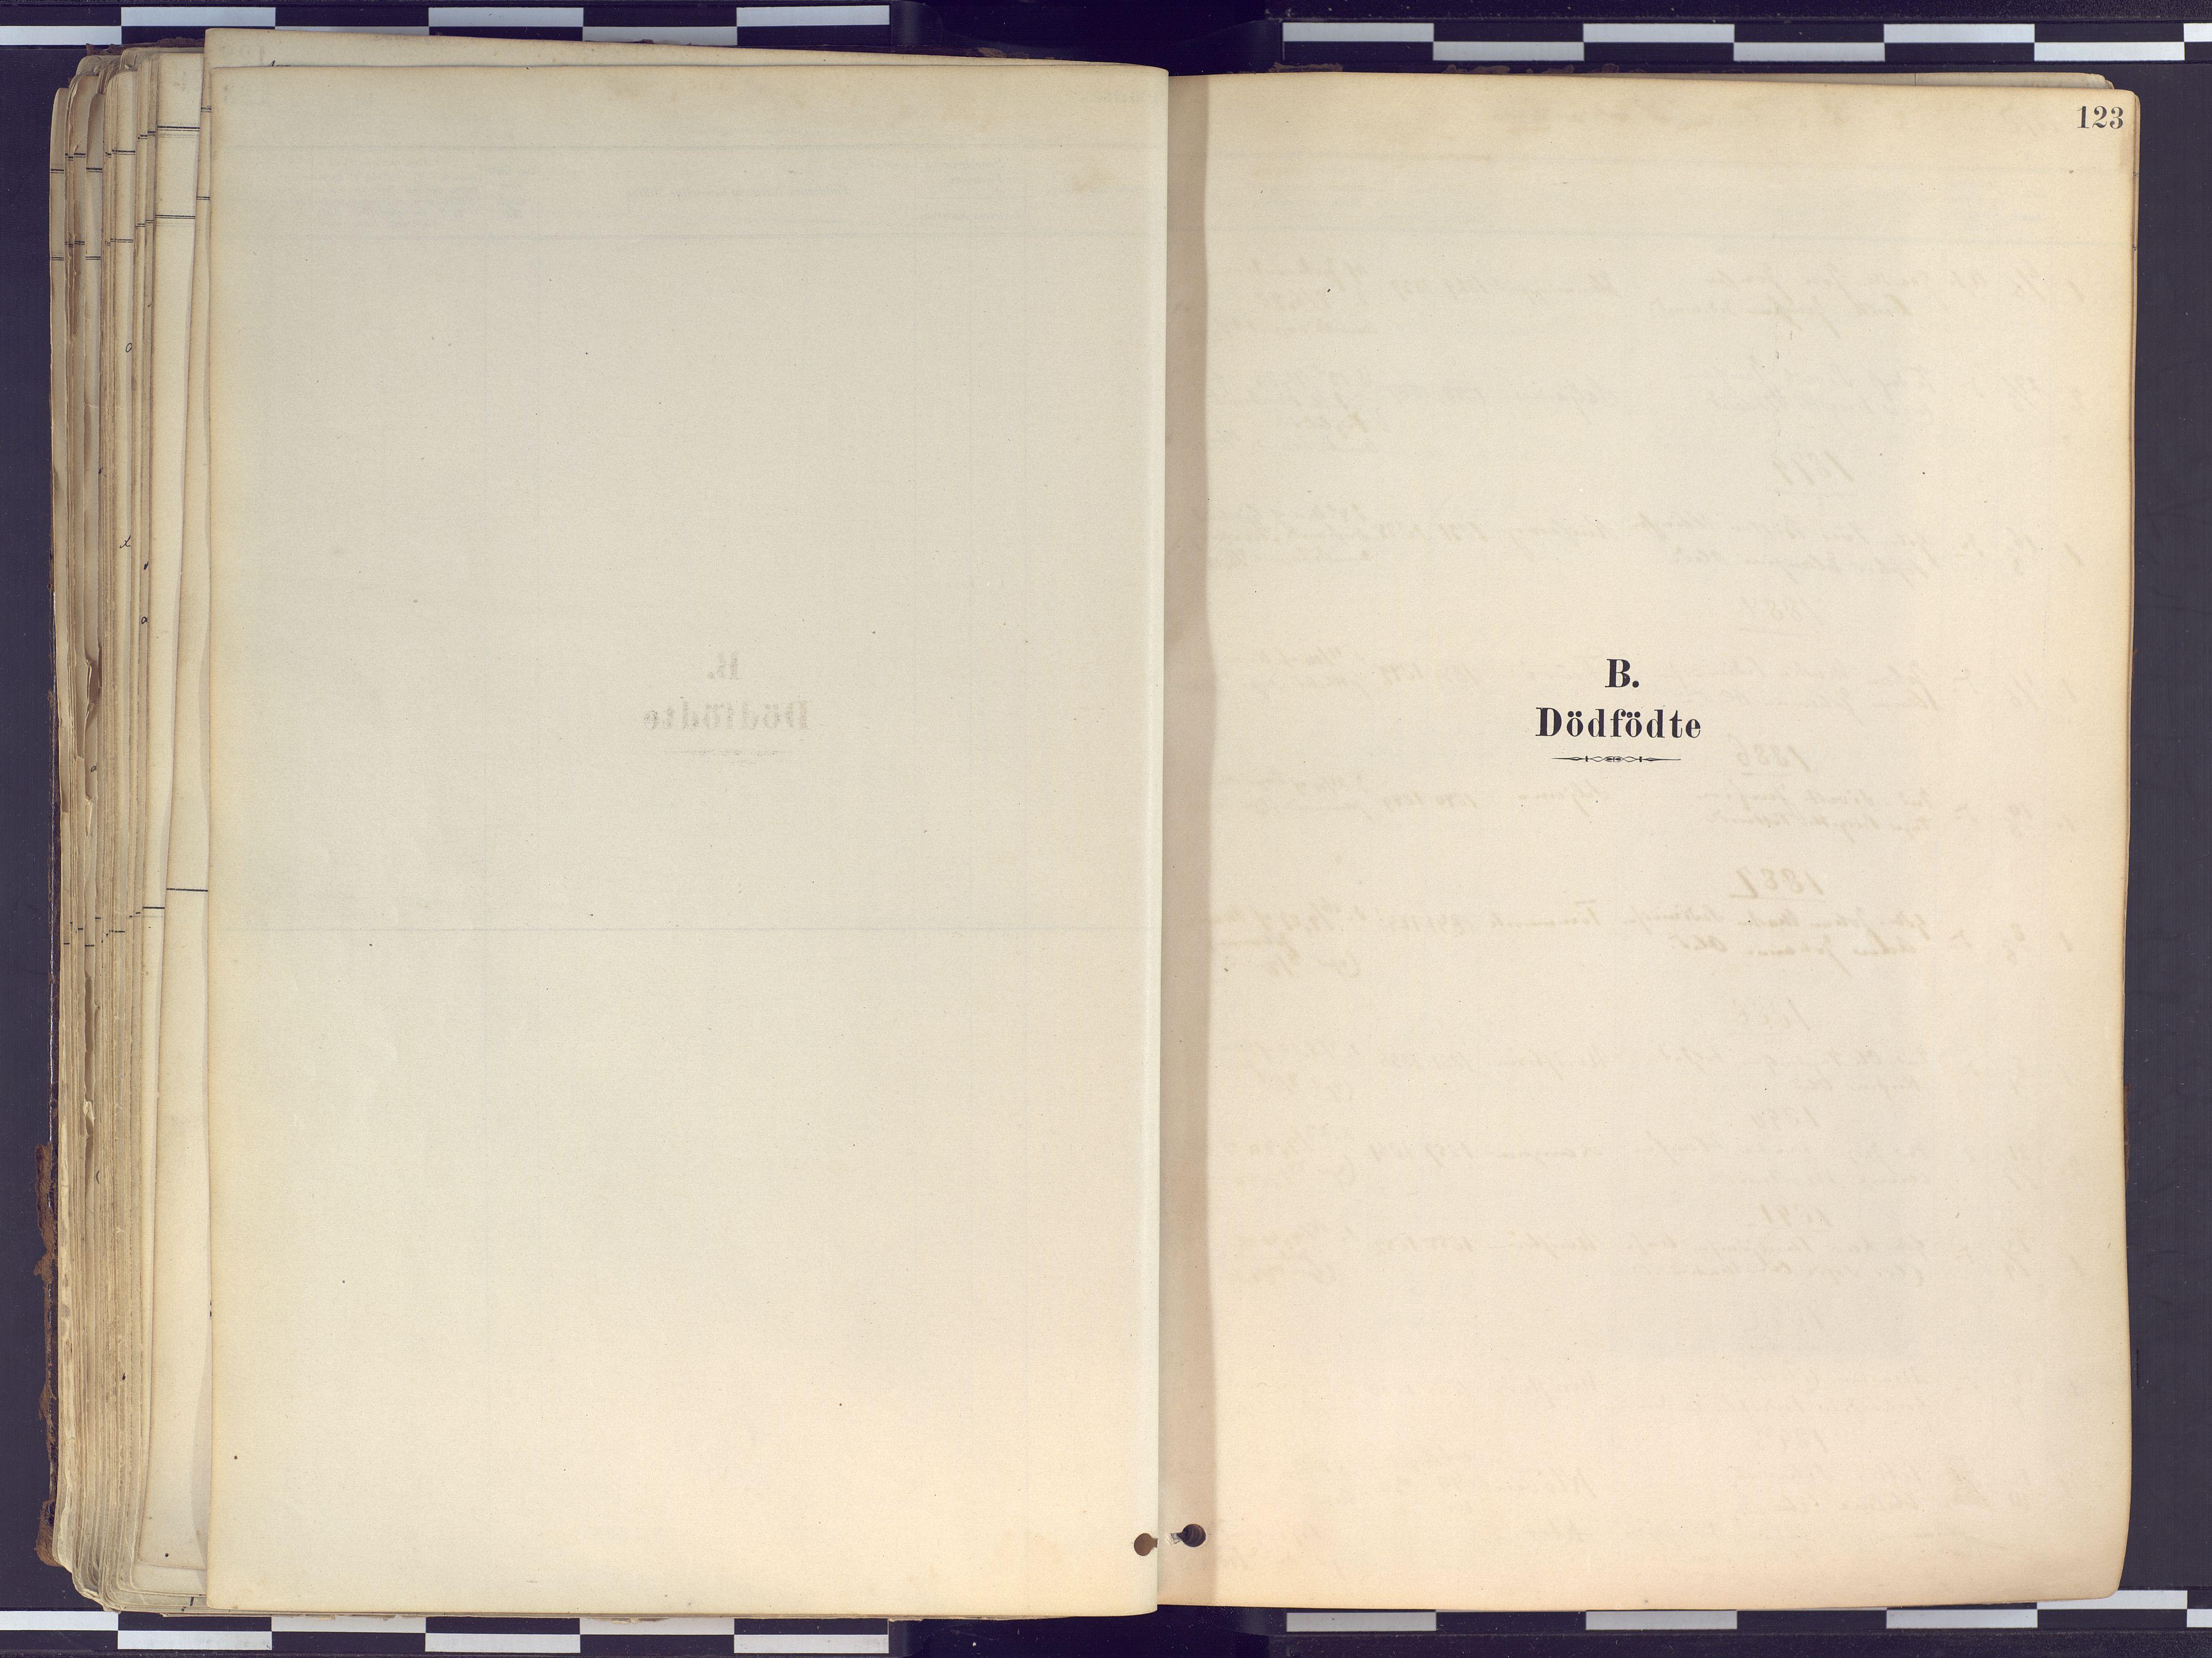 SATØ, Tranøy sokneprestkontor, I/Ia/Iaa/L0010kirke: Ministerialbok nr. 10, 1878-1904, s. 123